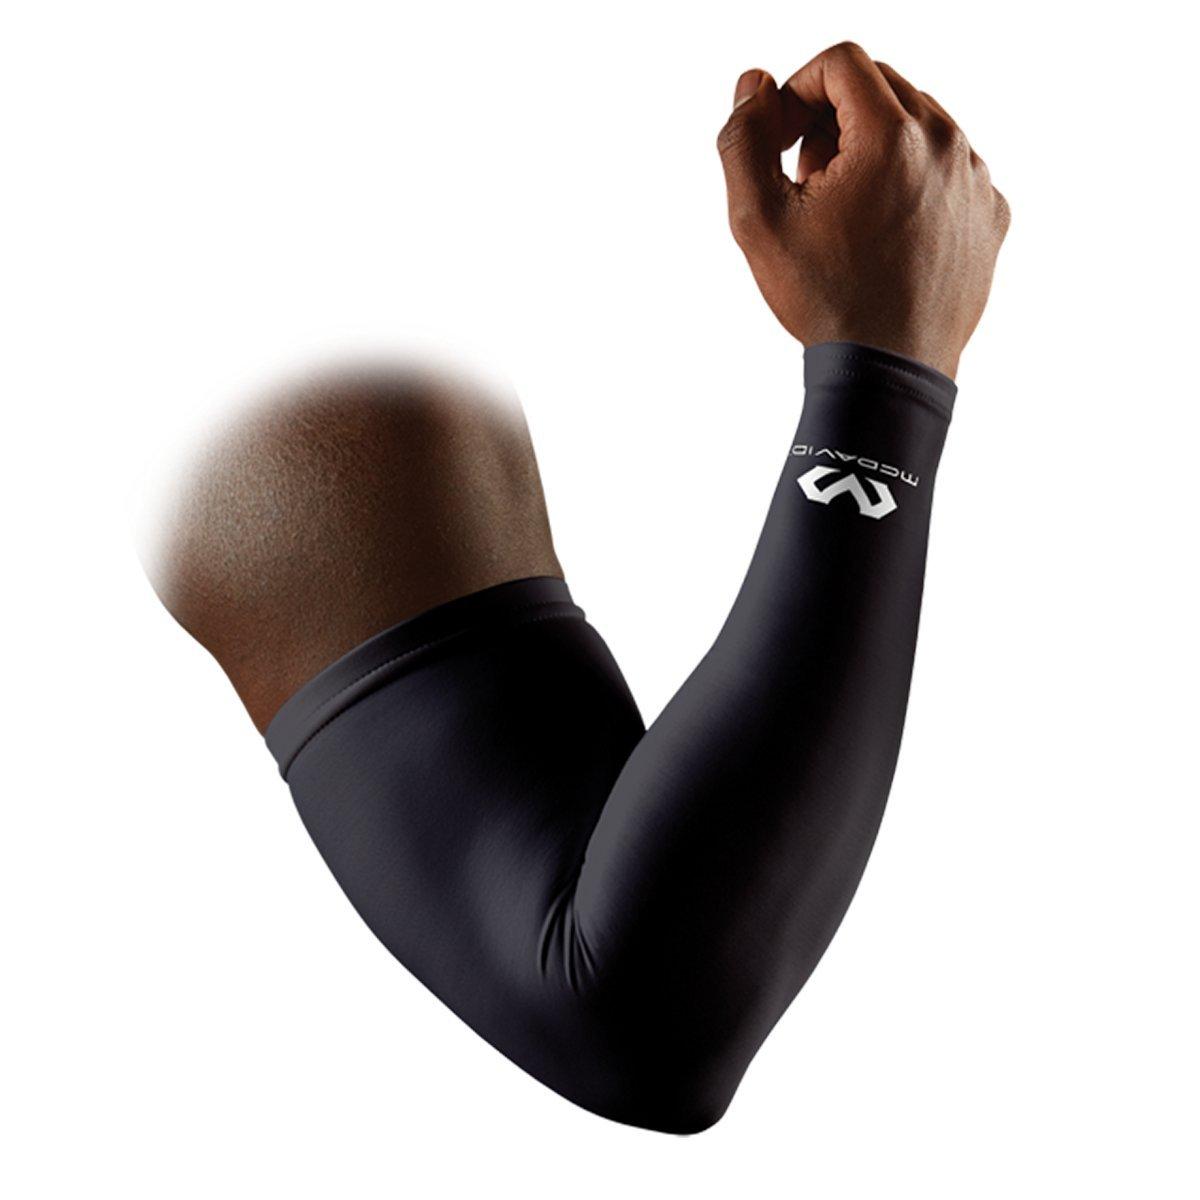 McDavid Pair Compression Reflective Arm Sleeves, Small, Ultra Black